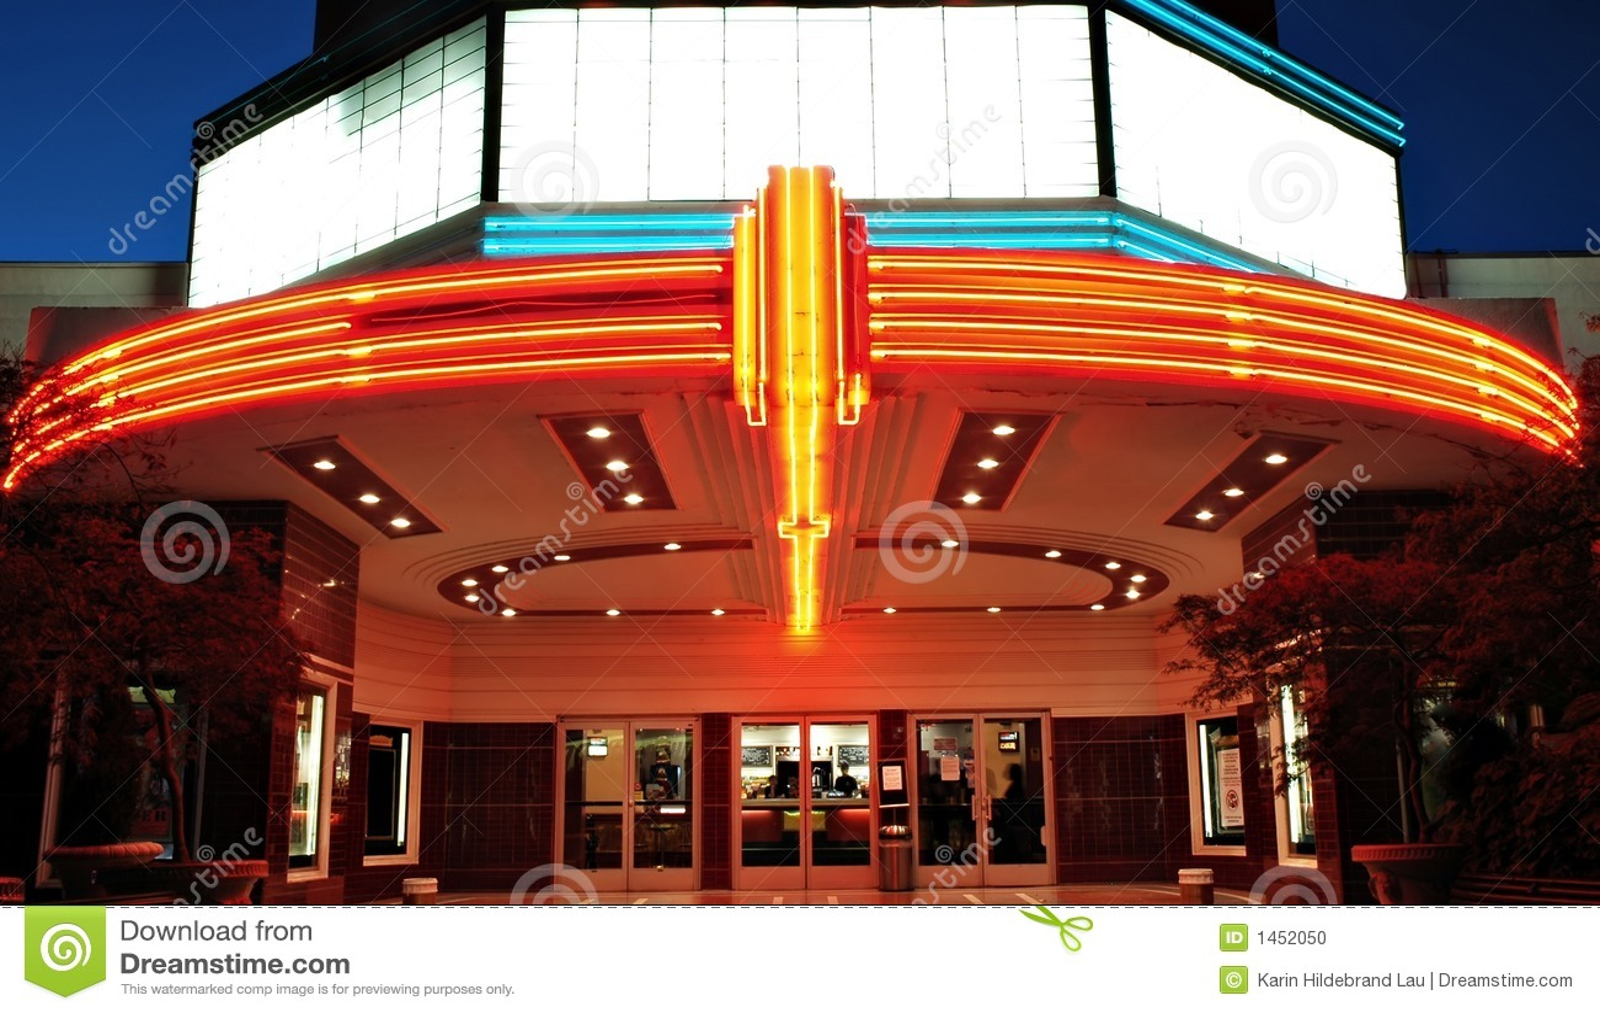 Vintage Movie Theater Stock Photo - Image: 1452050